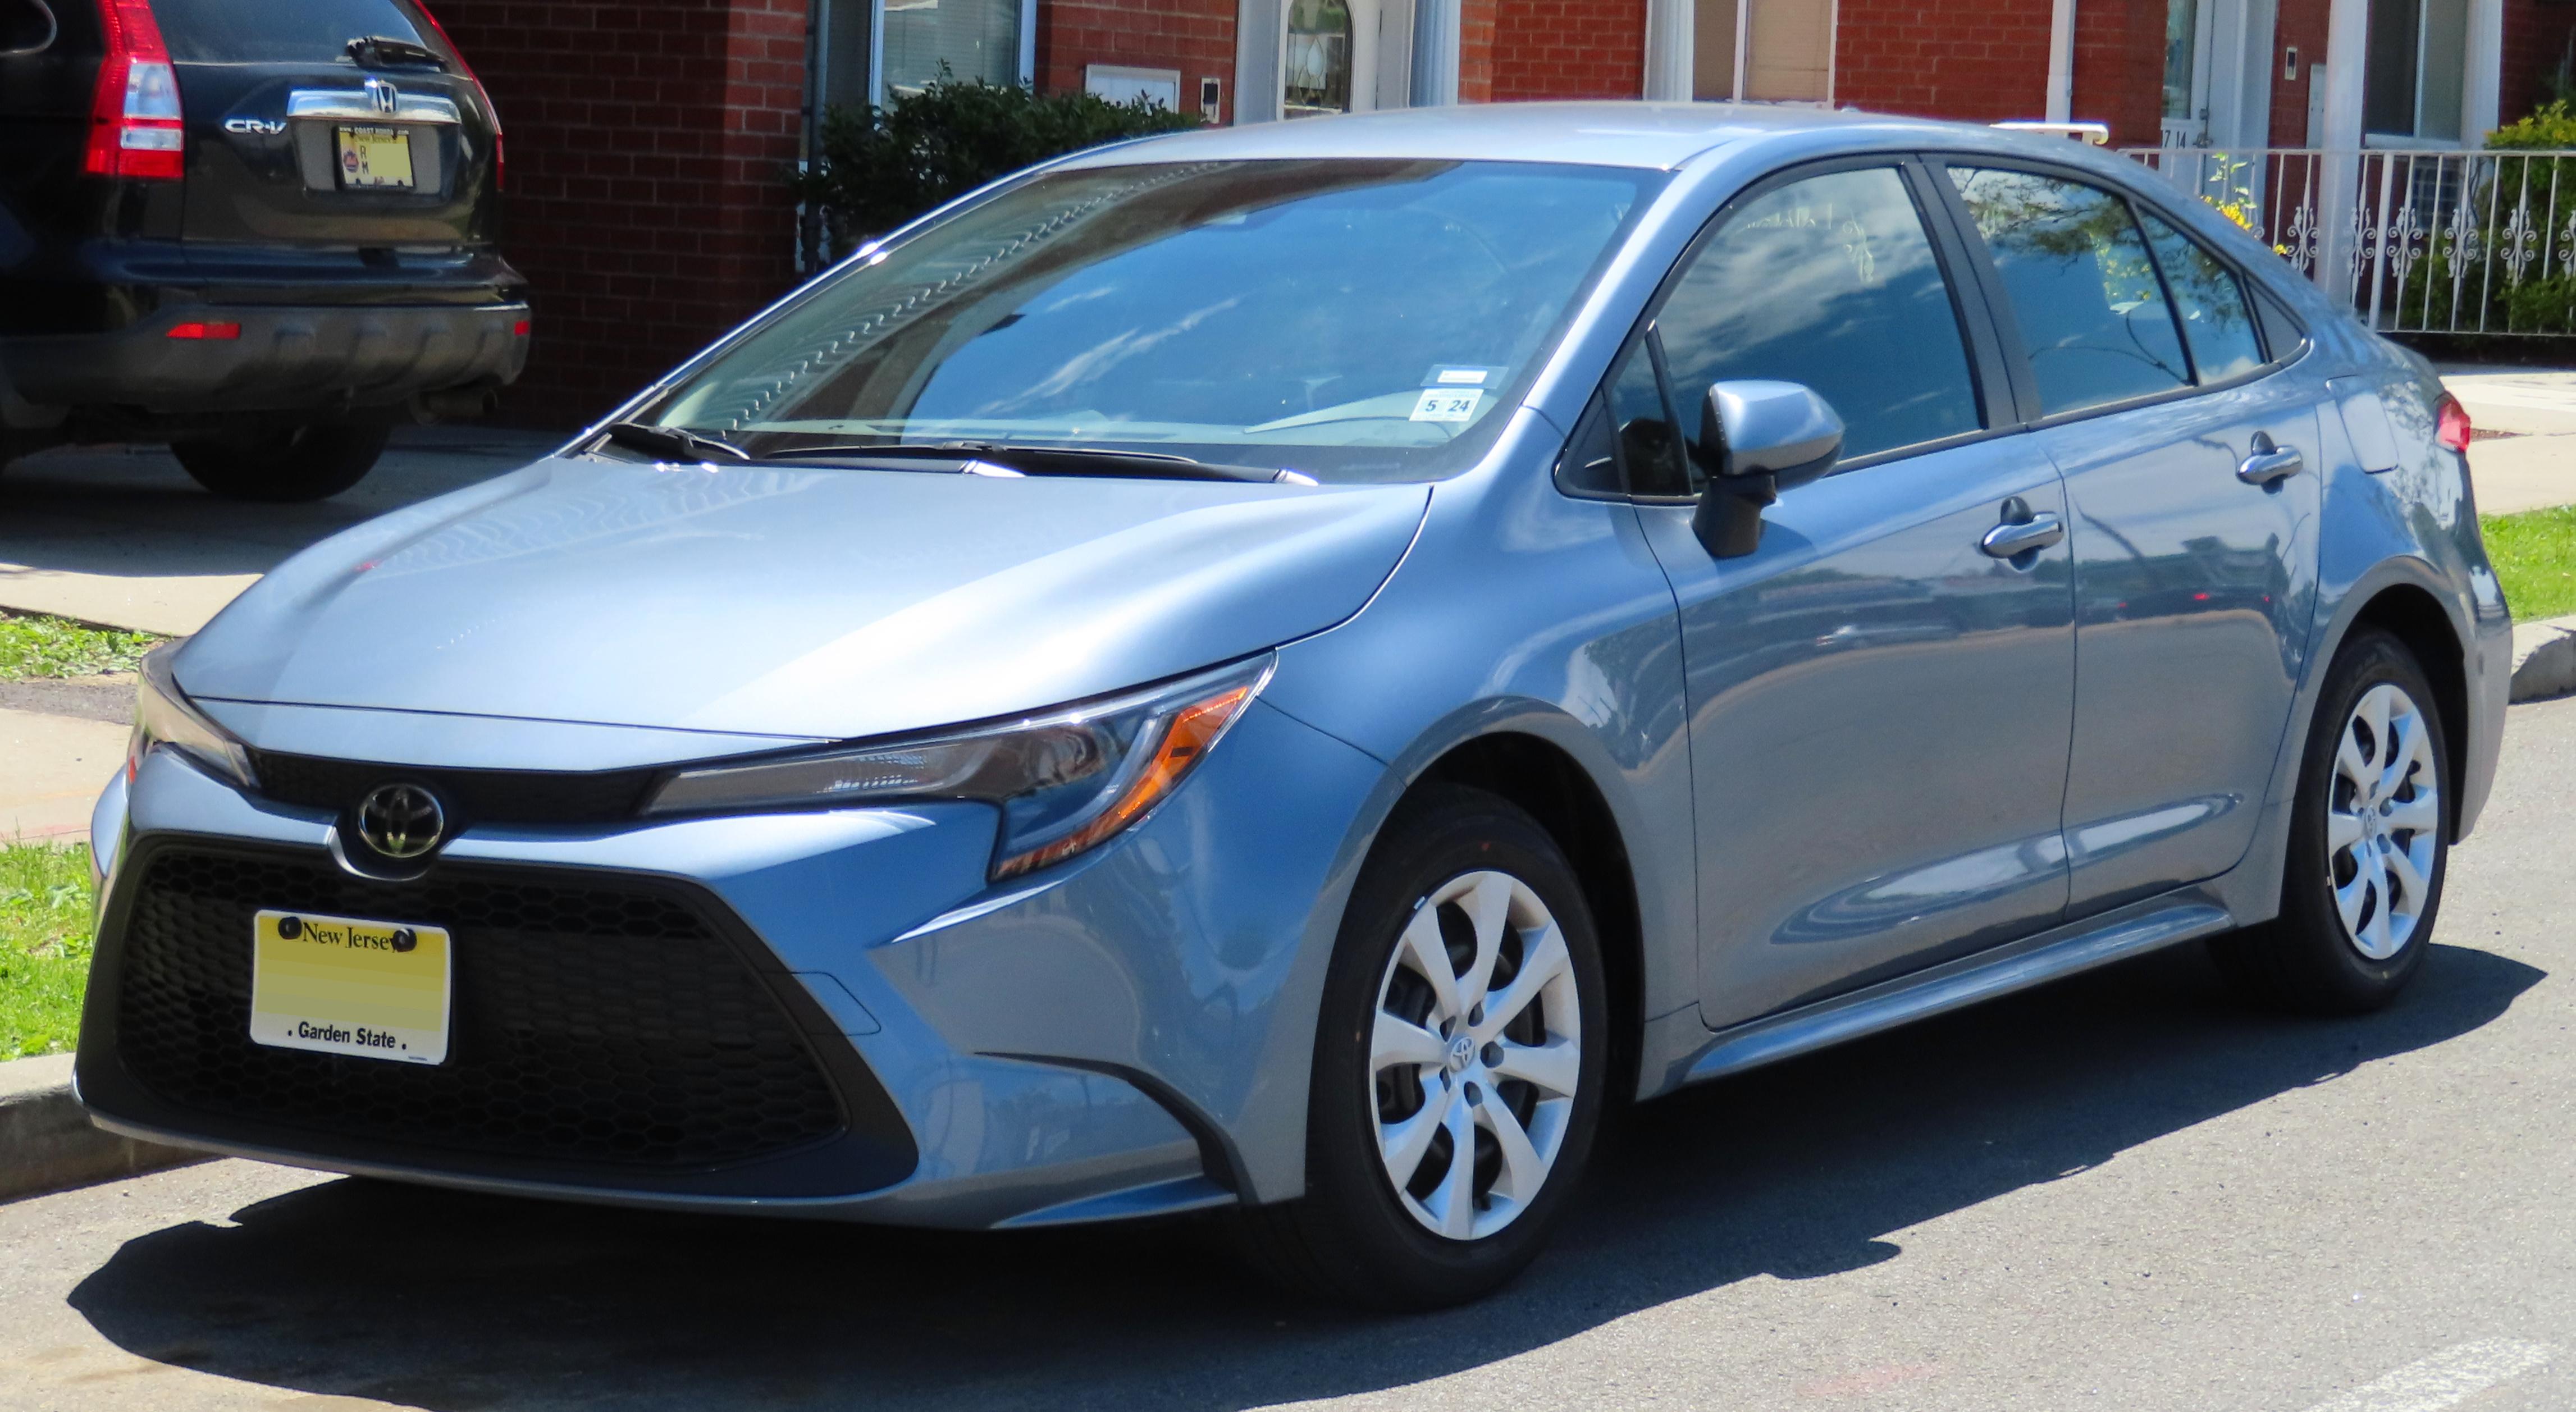 Toyota Corolla Wikipédia A Enciclopédia Livre